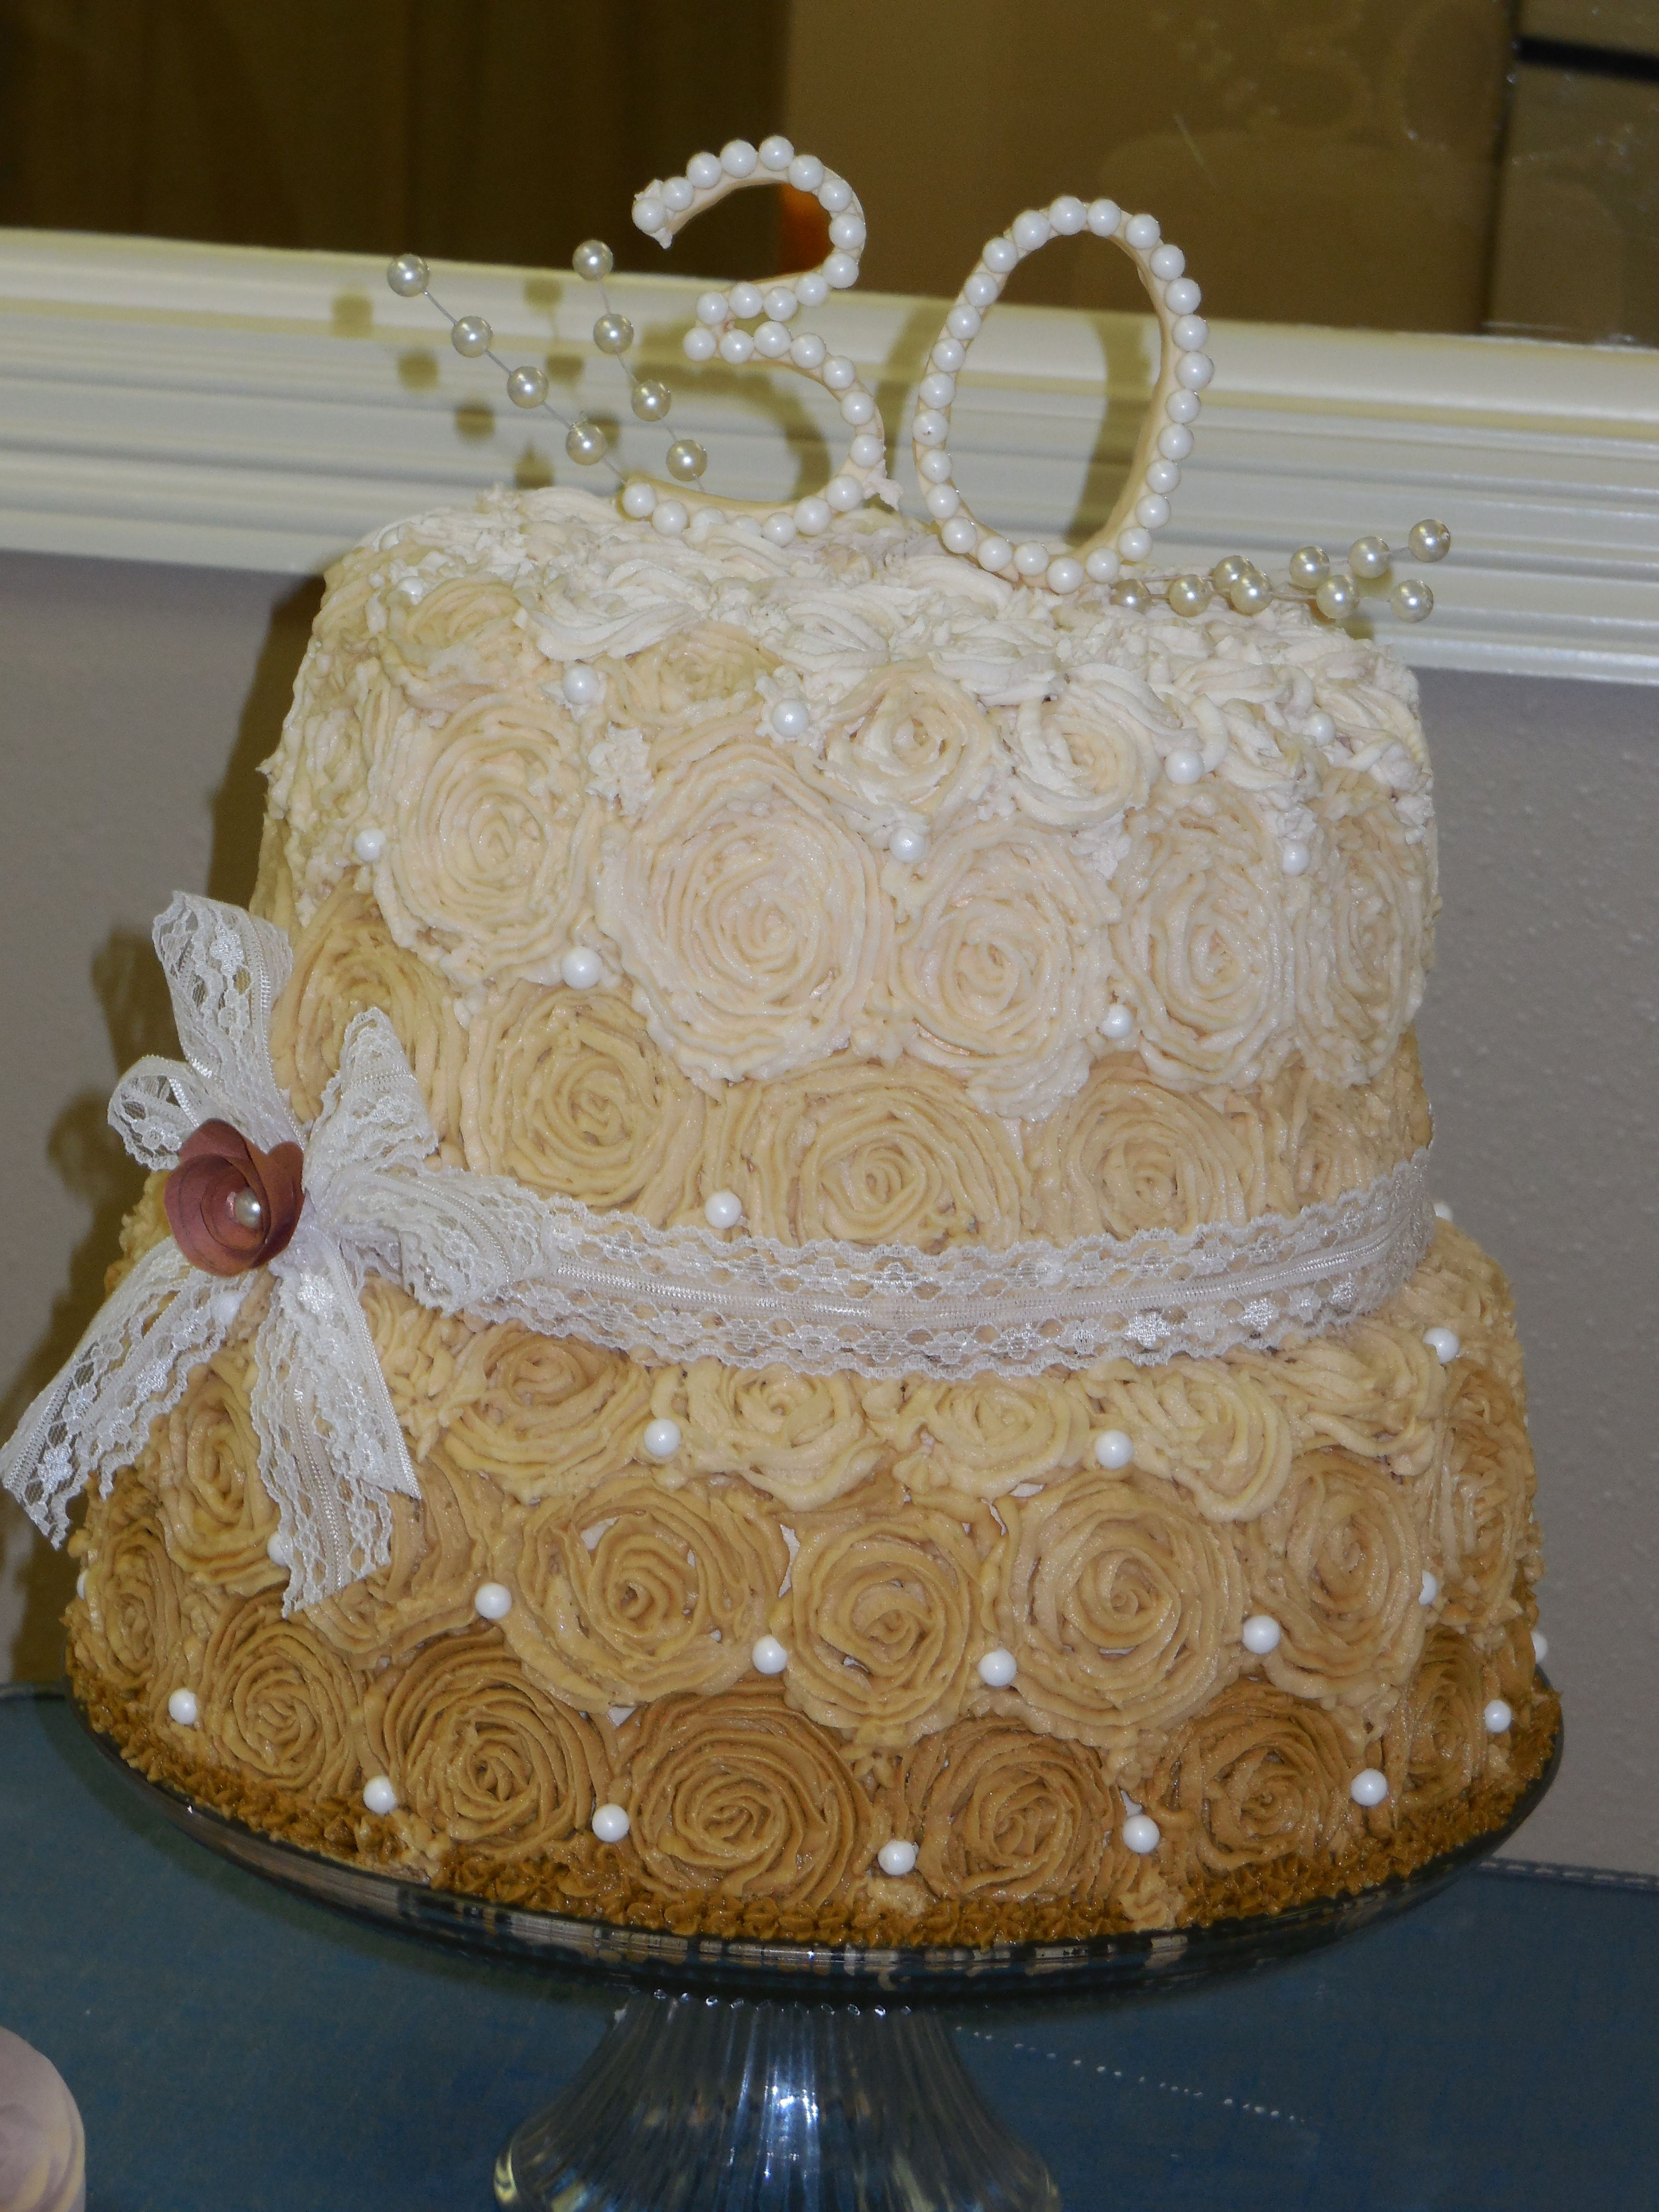 30th anniversary cake | Cakes I made: Cristina | Pinterest | 30th ...